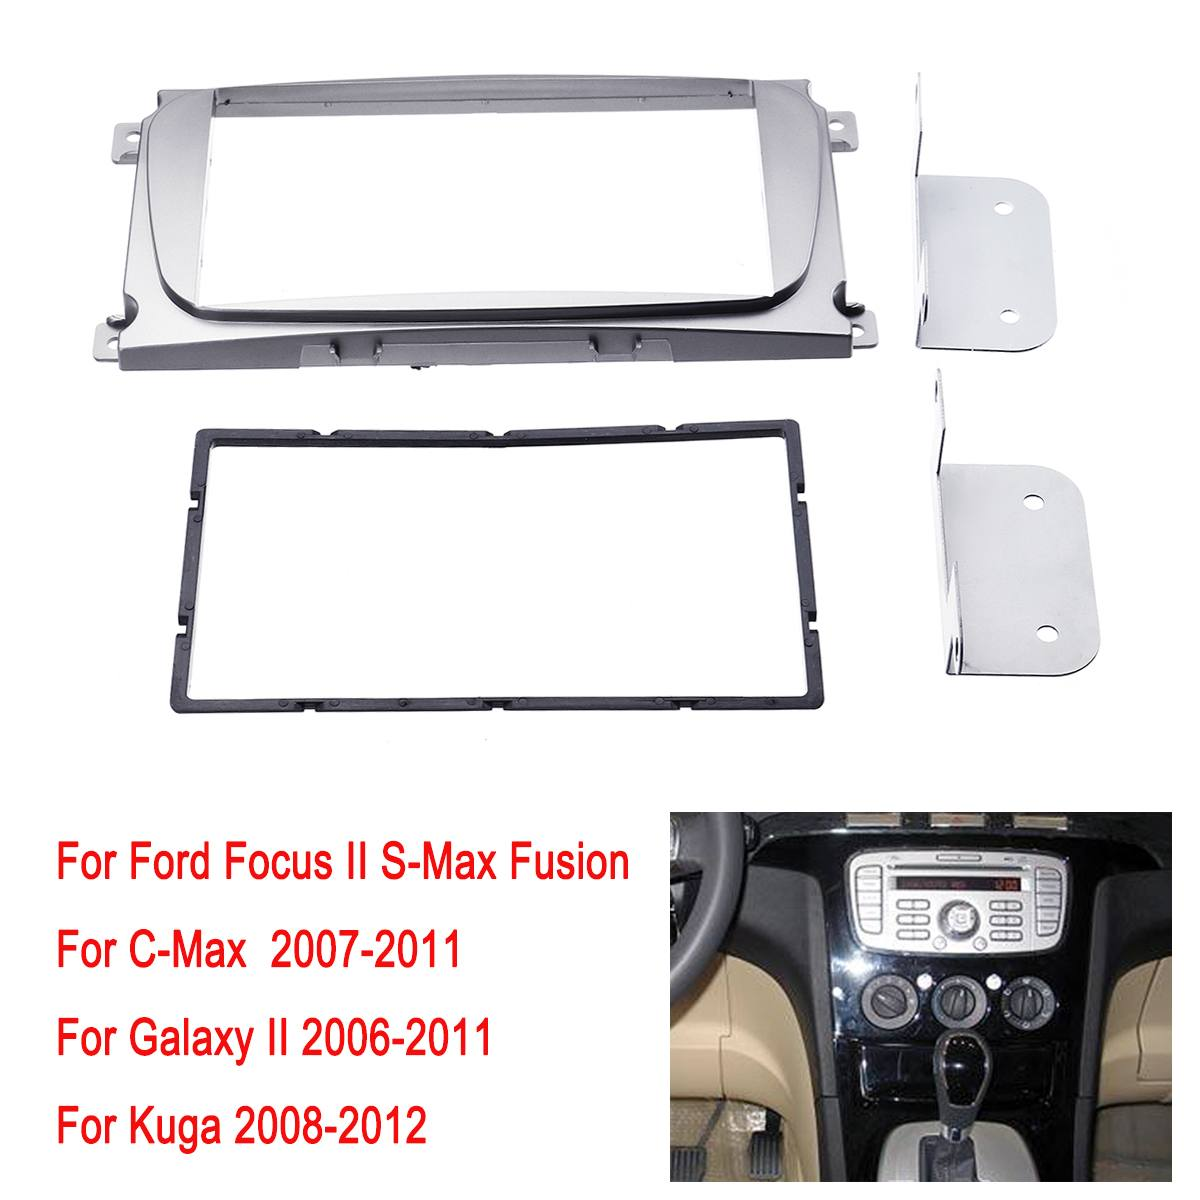 2 Din Car Radio Stereo Fascia Placa Painel Quadro Kit Para Ford Para A Focus Mondeo Ii S Max C Max Ii Galaxia Kuga